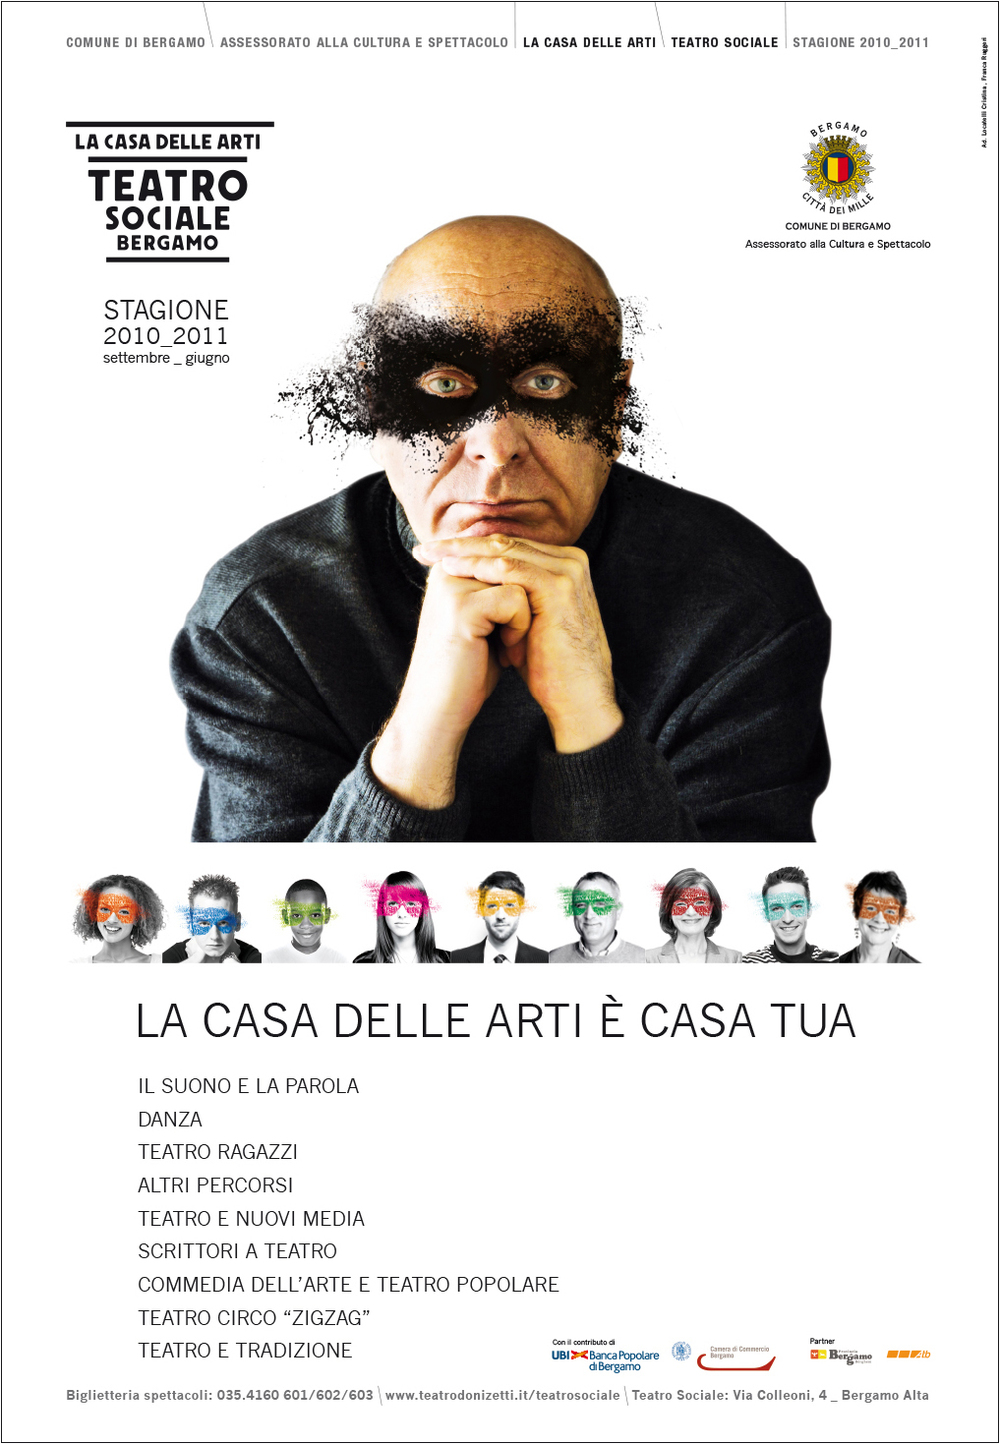 manifesto 70X100 cm, stagione 2010_2011